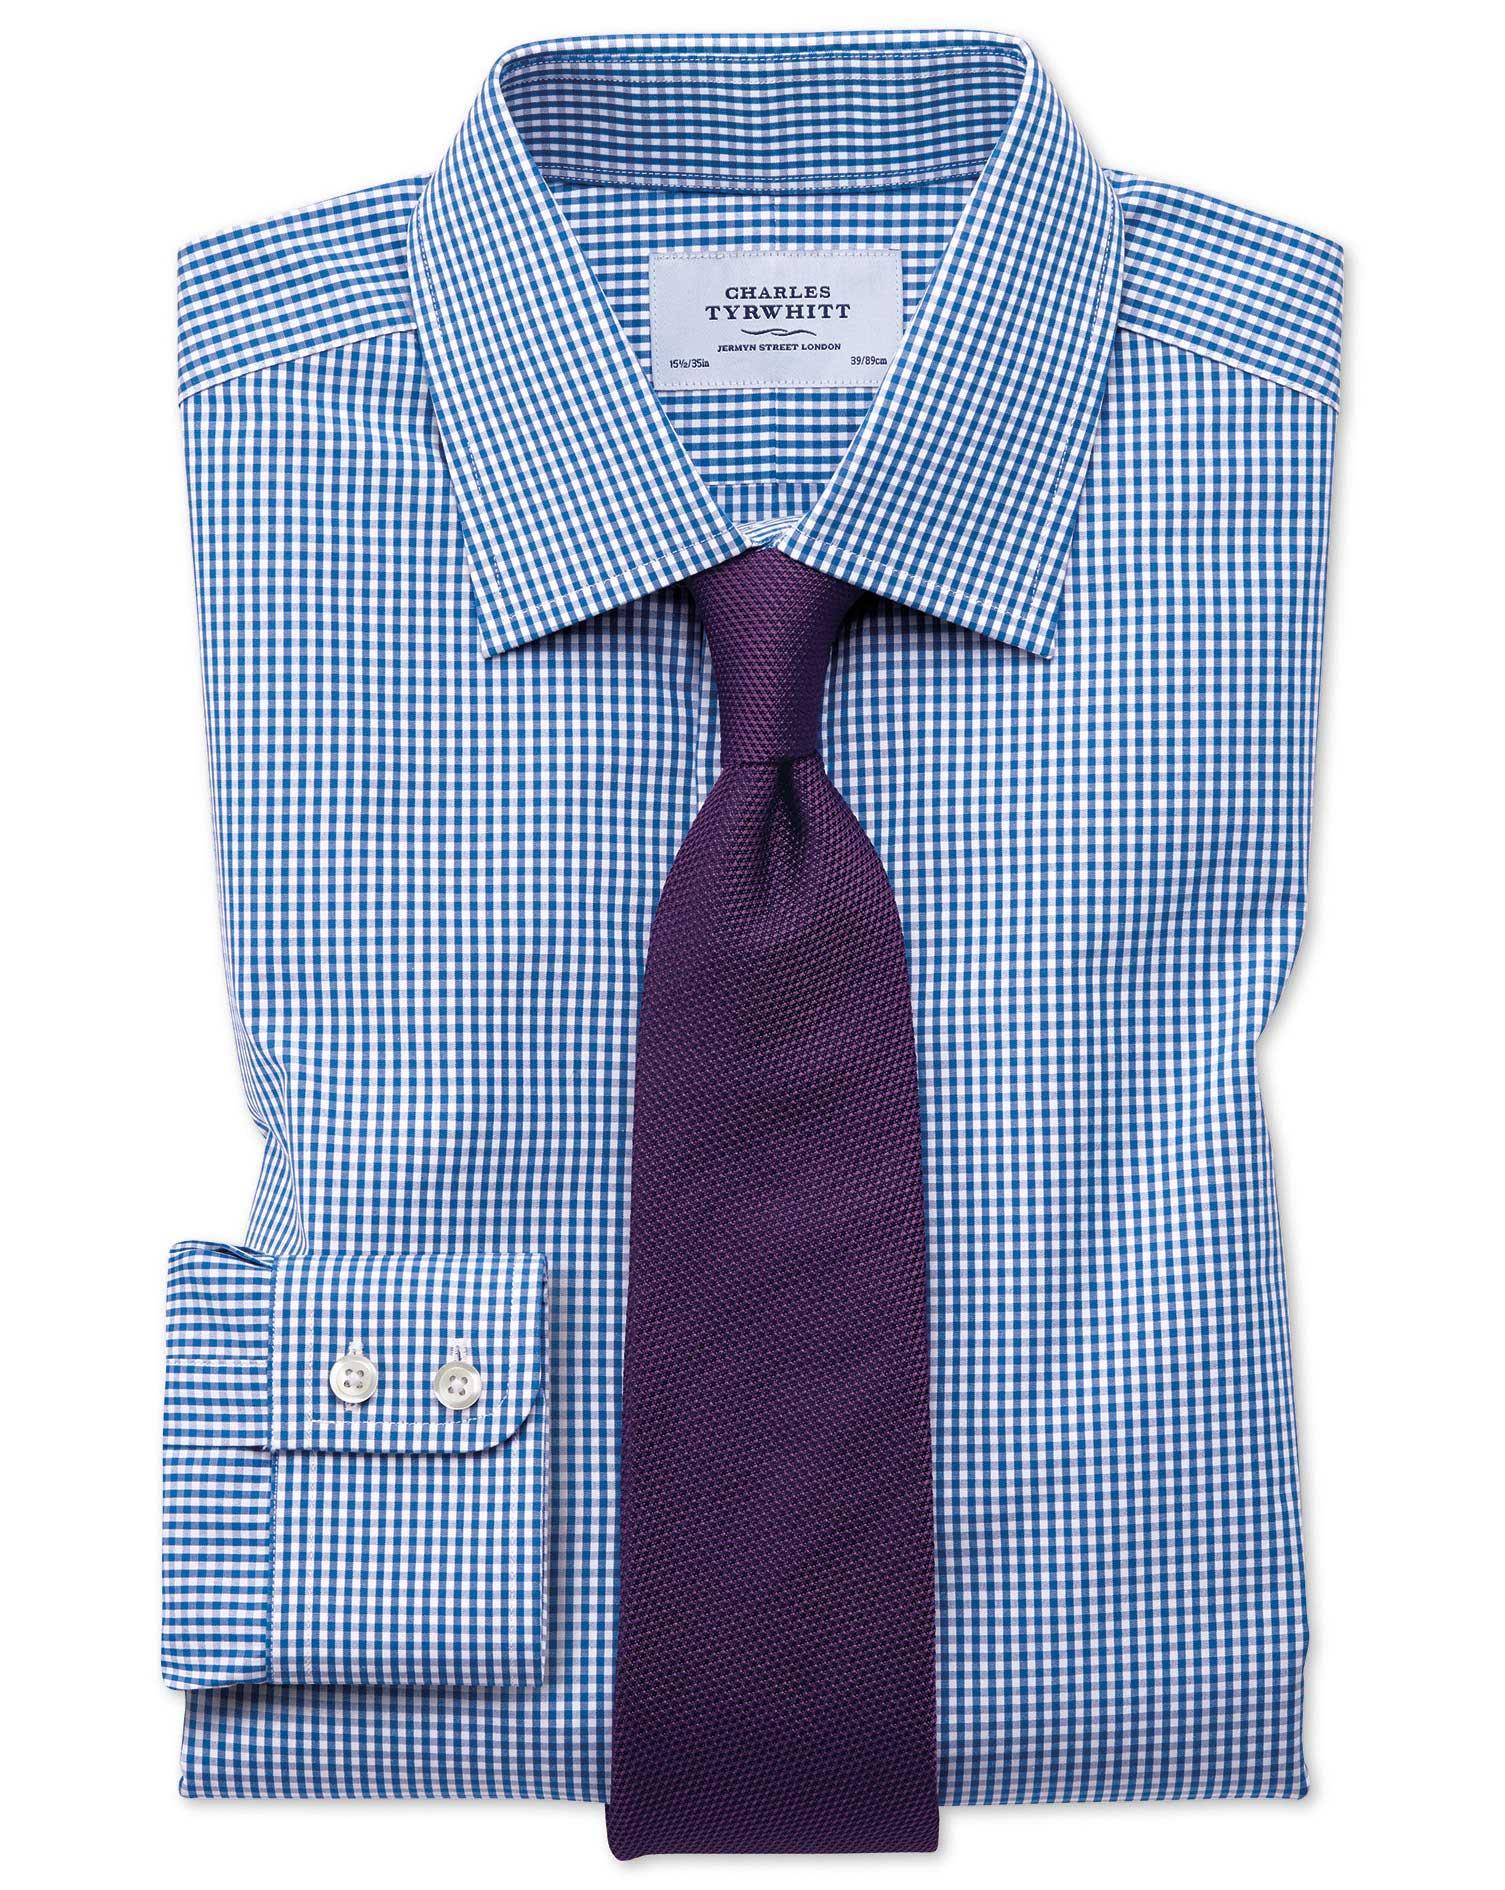 classic fit small gingham check navy shirt charles tyrwhitt